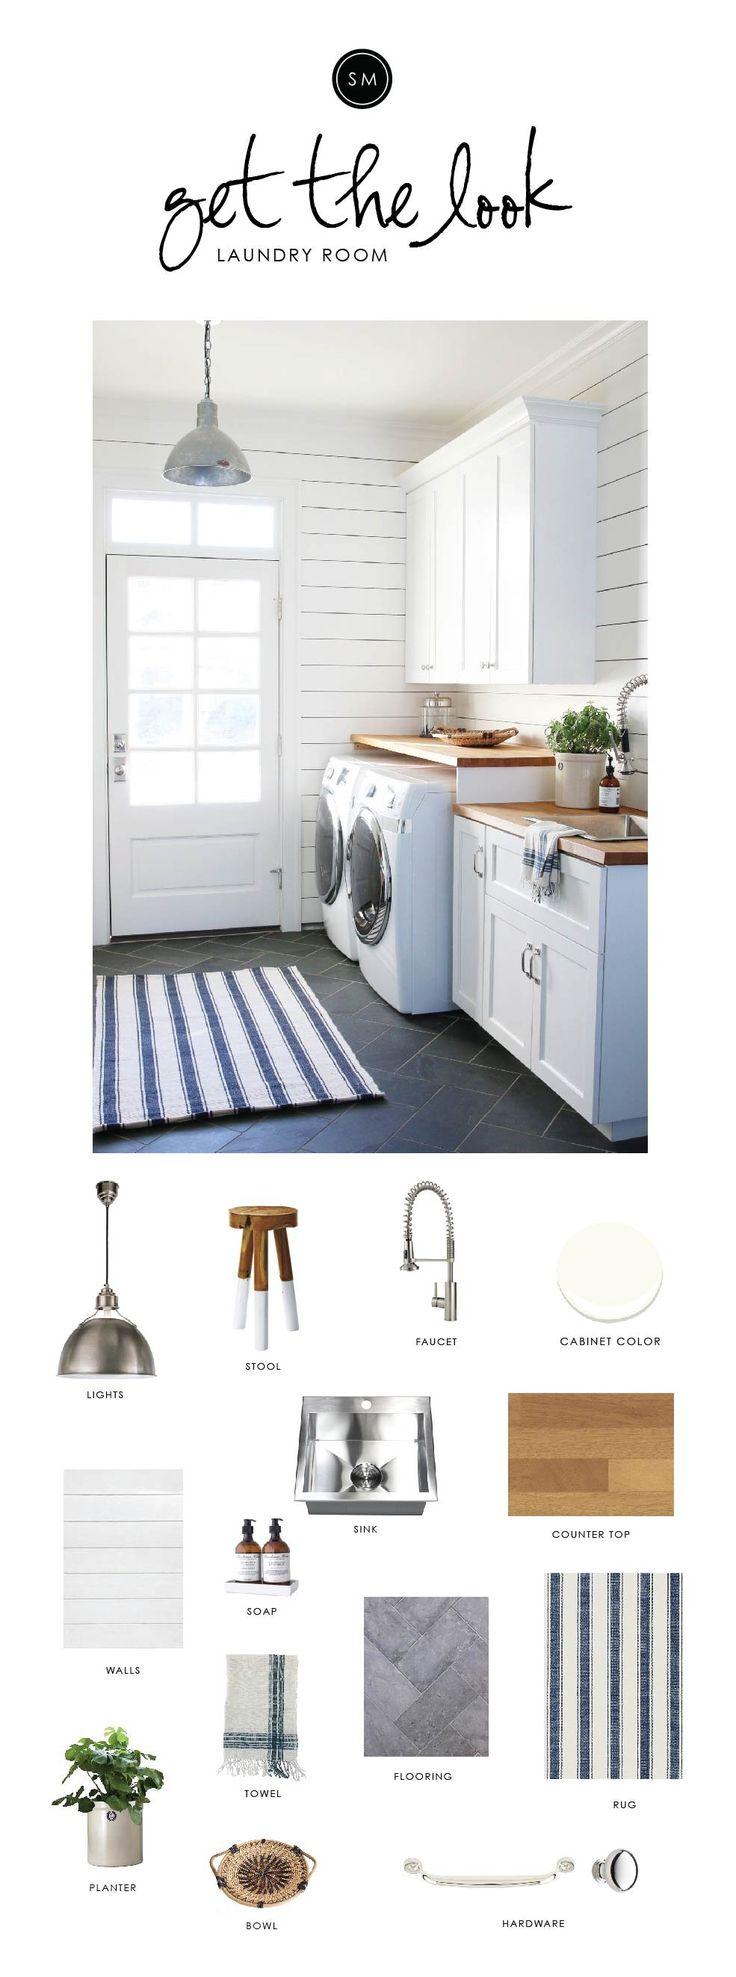 Oc Kitchen And Flooring 17 Best Ideas About Kitchen Faucets On Pinterest Kitchen Sink